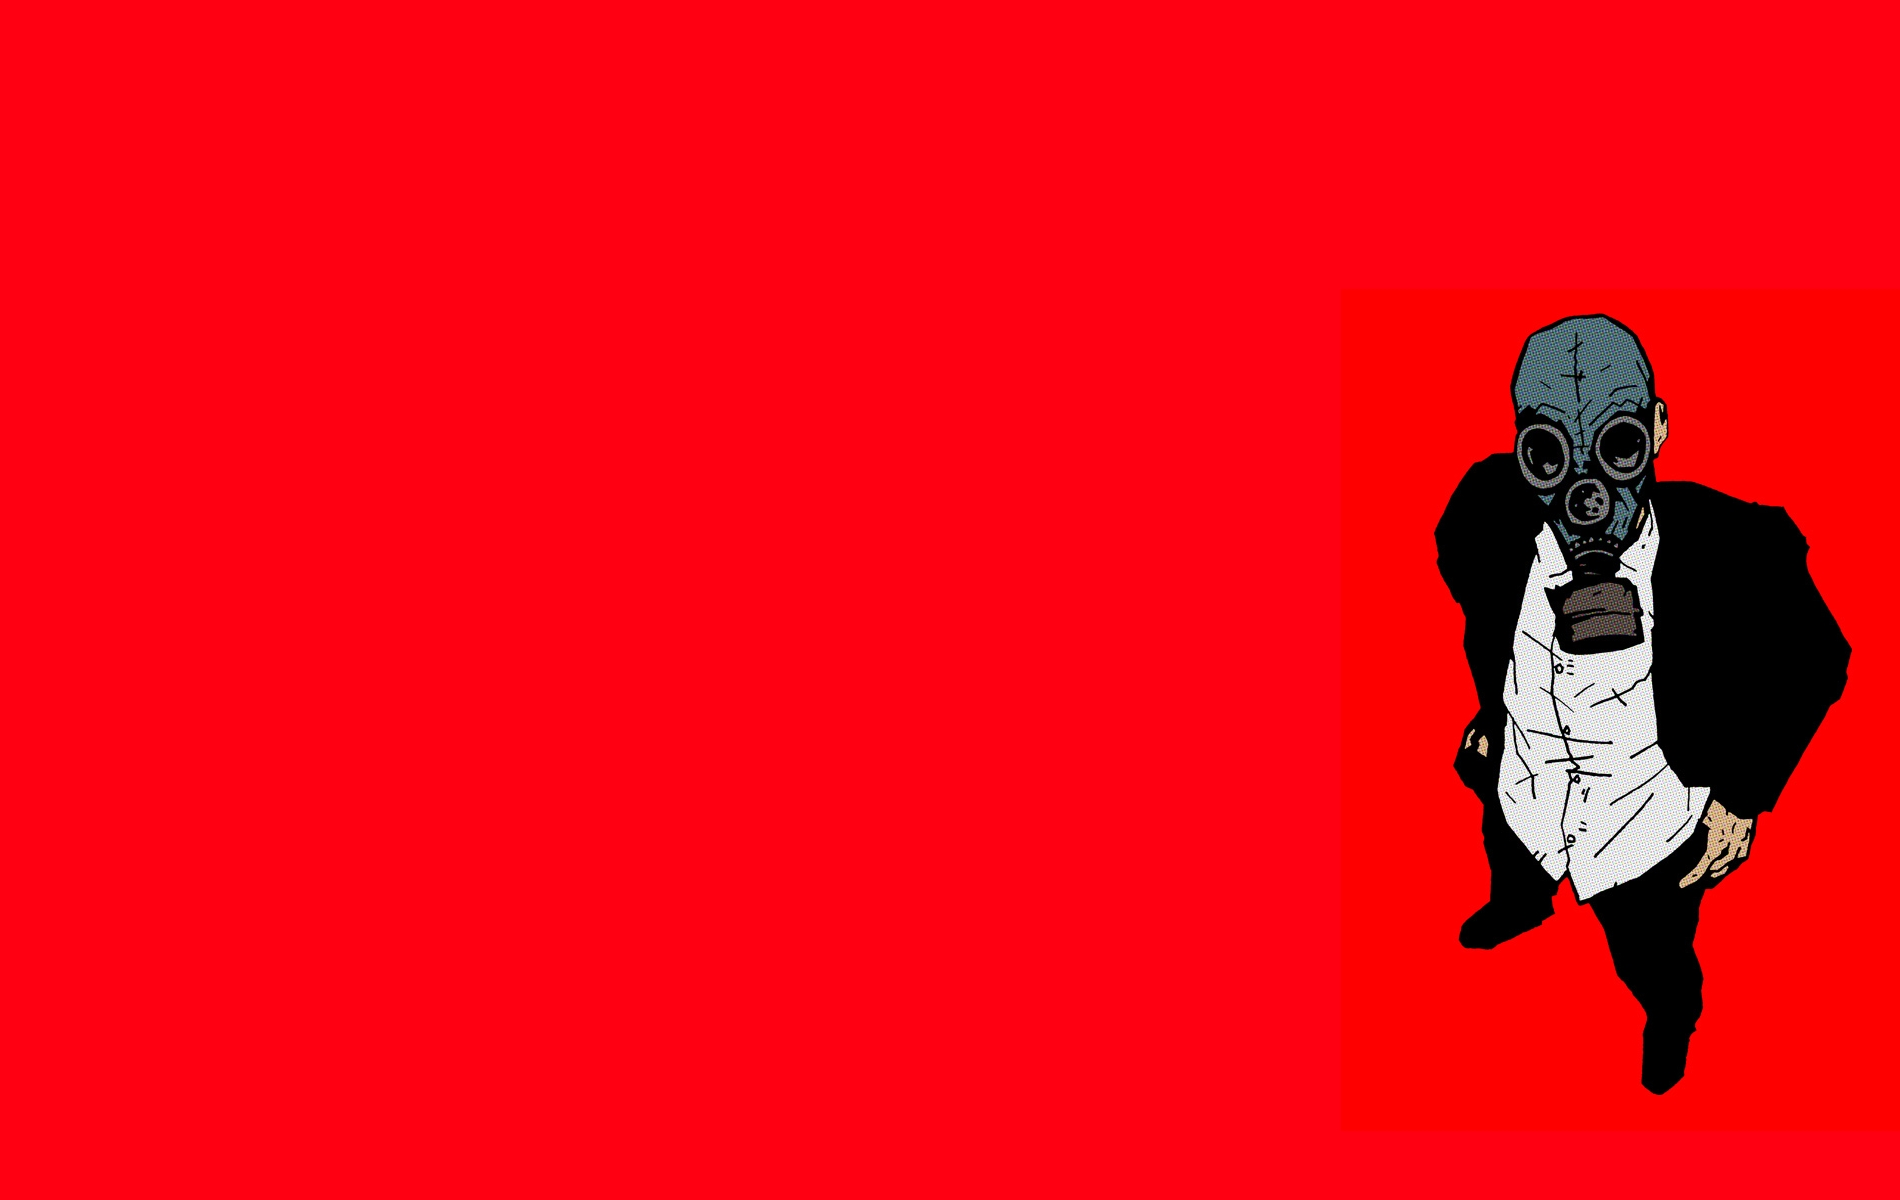 Gas Mask Wallpaper and...V For Vendetta Mask Wallpaper